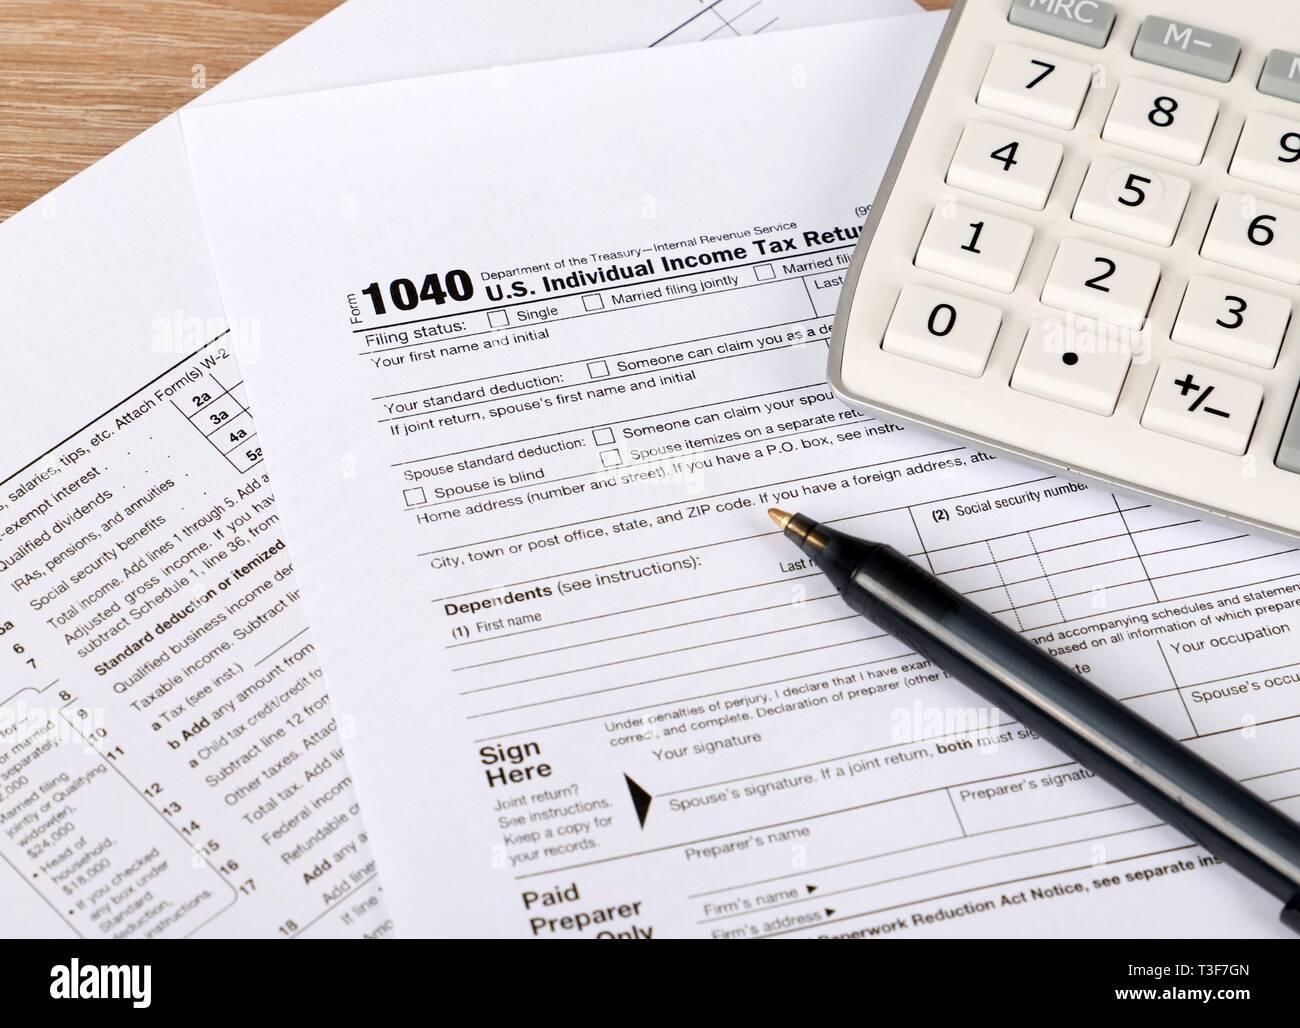 form 1040 calculator  12 tax form - individual income tax return form 12 lies ...